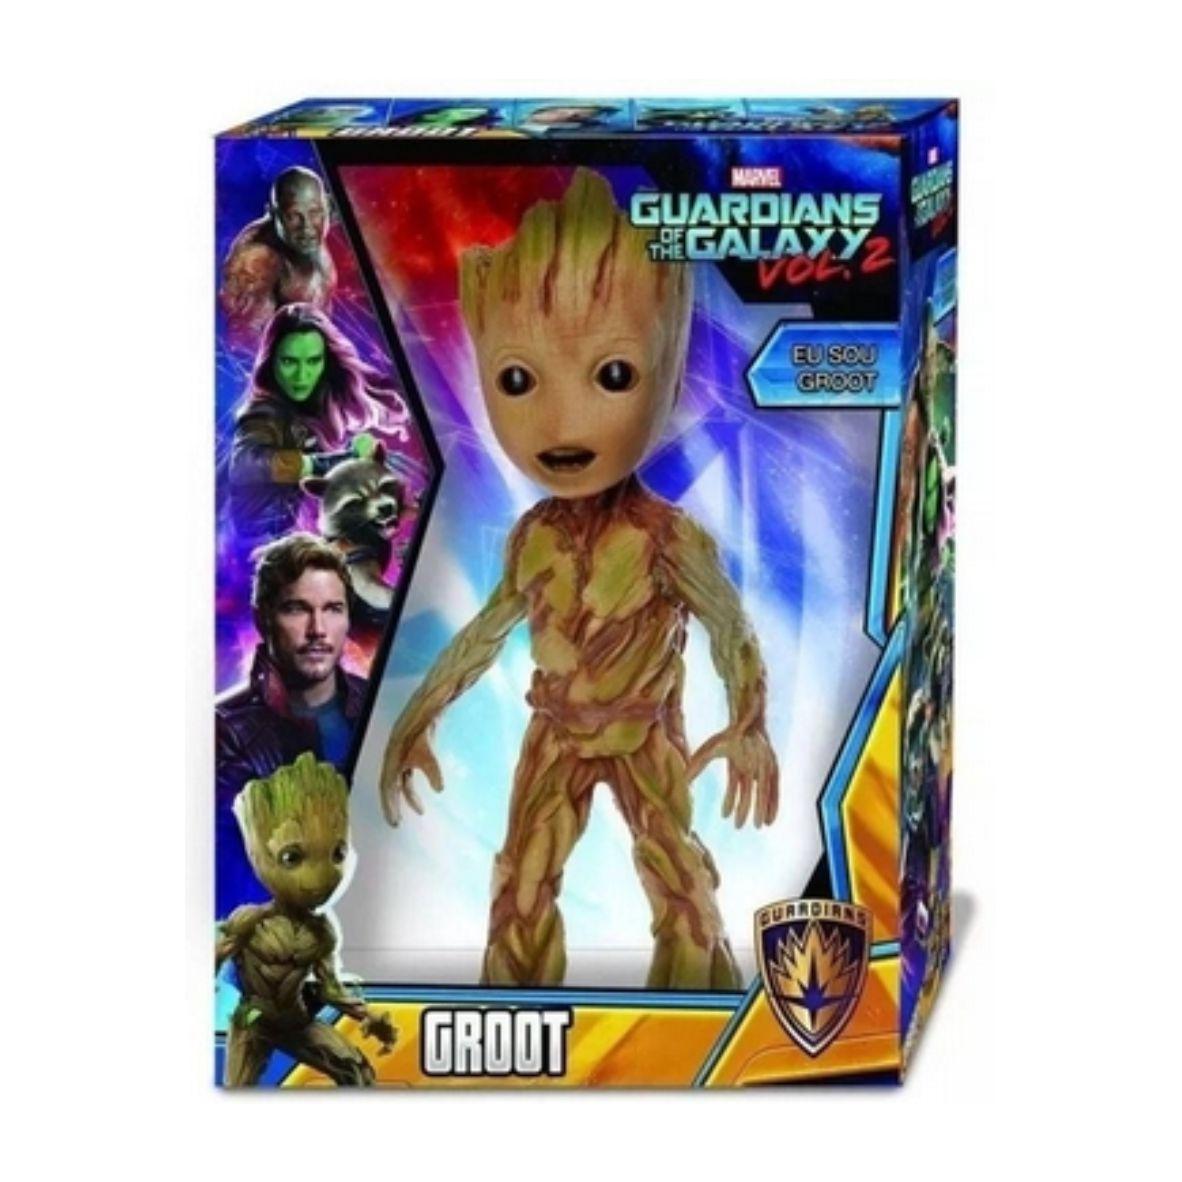 Boneco Groot Marvel Revolution 50 cm - Guardian Of Hhe Galaxy Vol. 2 - Mimo Toys